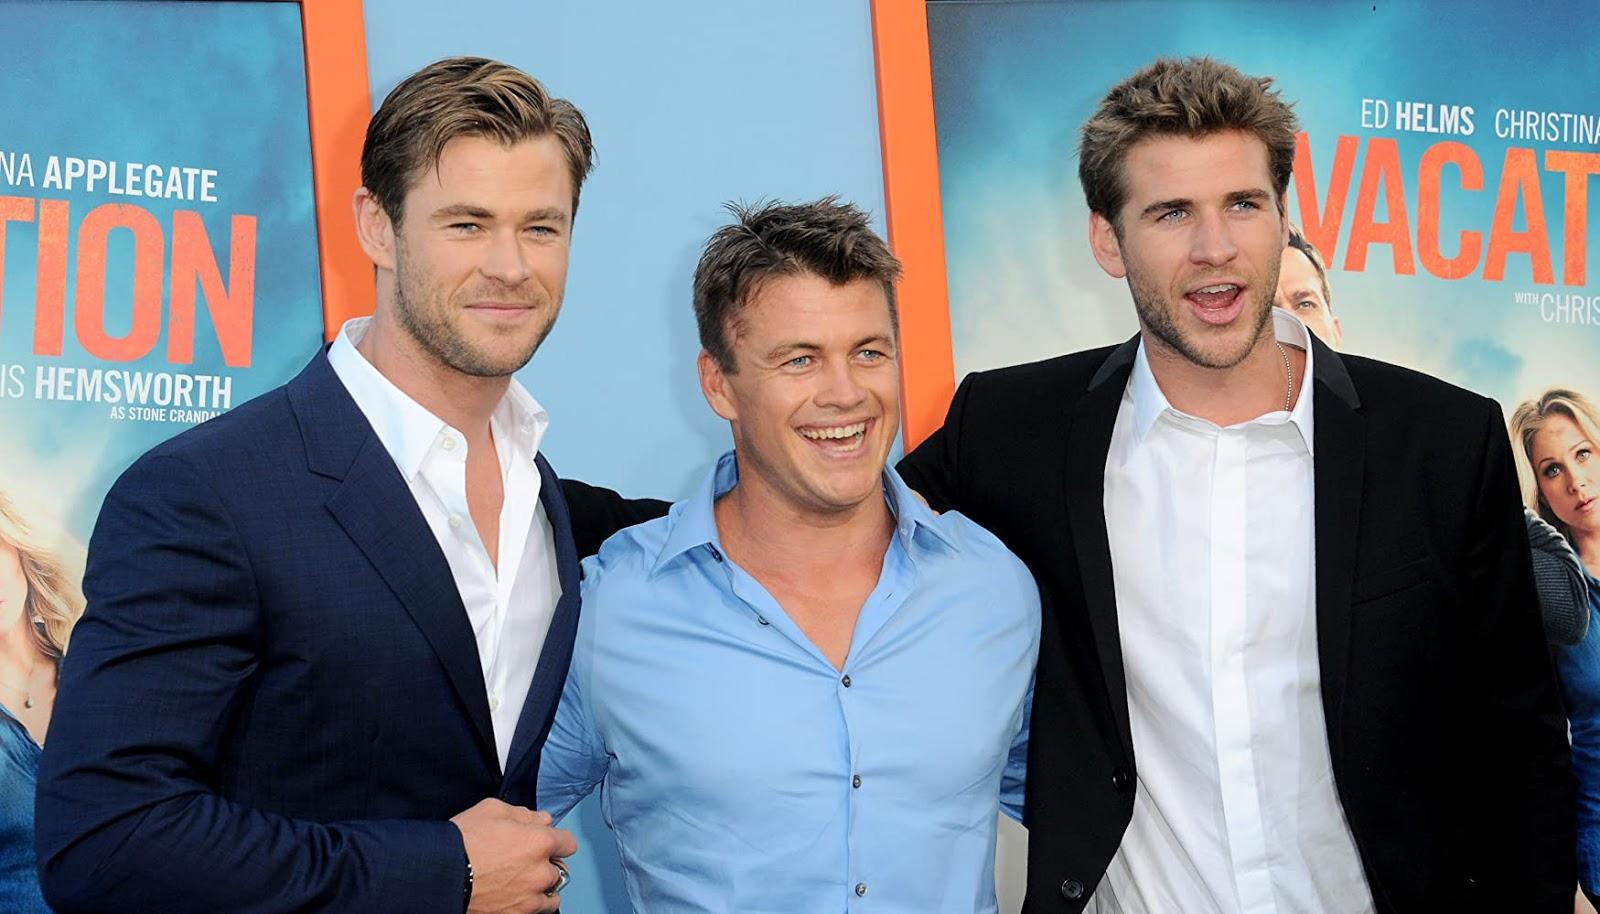 Chris Hemsworth, Luke Hemsworth, and Liam Hemsworth